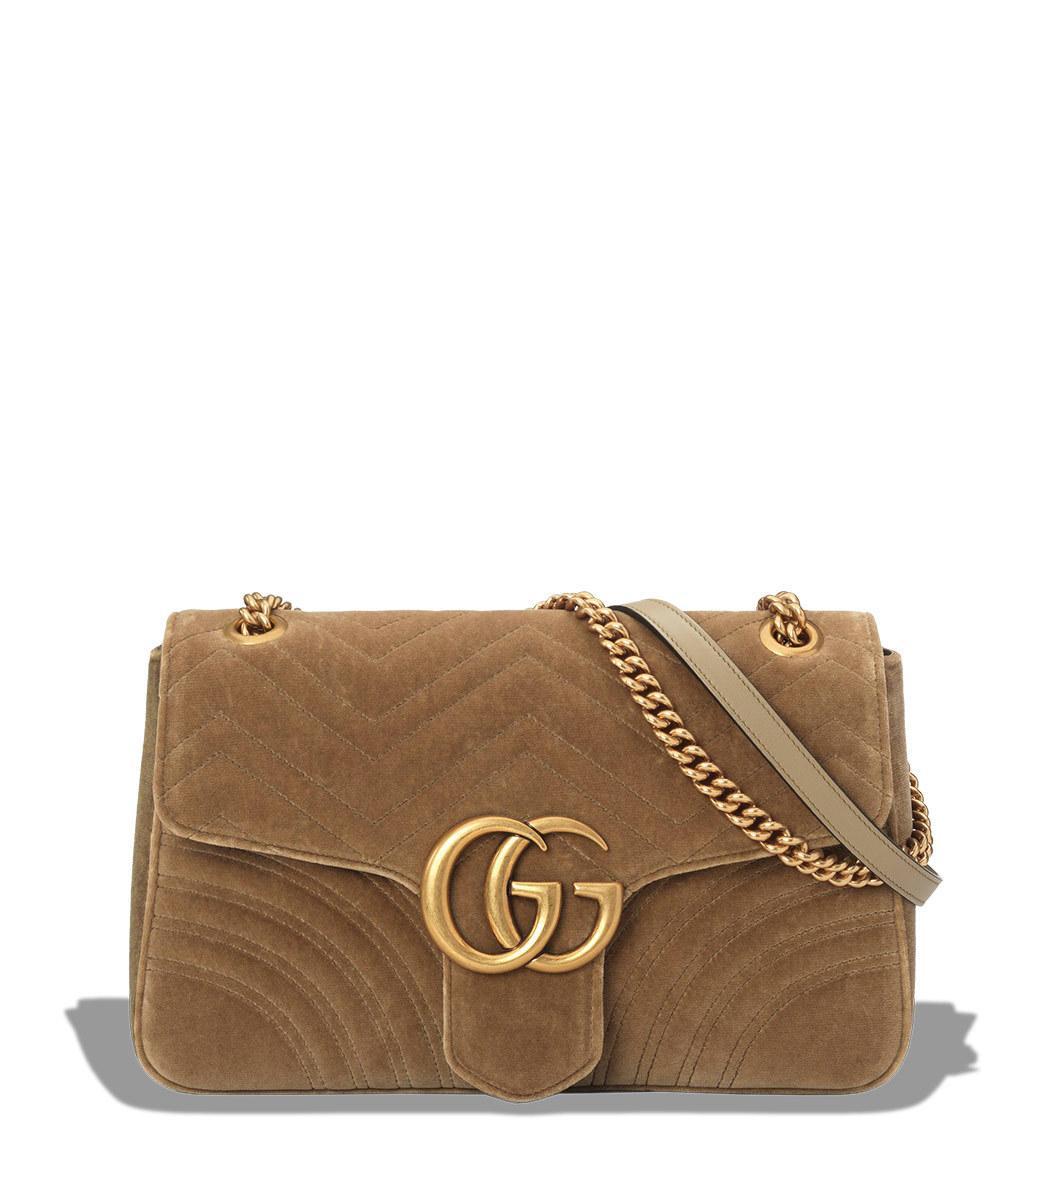 e6a9cc24b7c1 Gucci Medium Gg Marmont 2.0 Matelasse Velvet Shoulder Bag - Brown In 2807  Beige